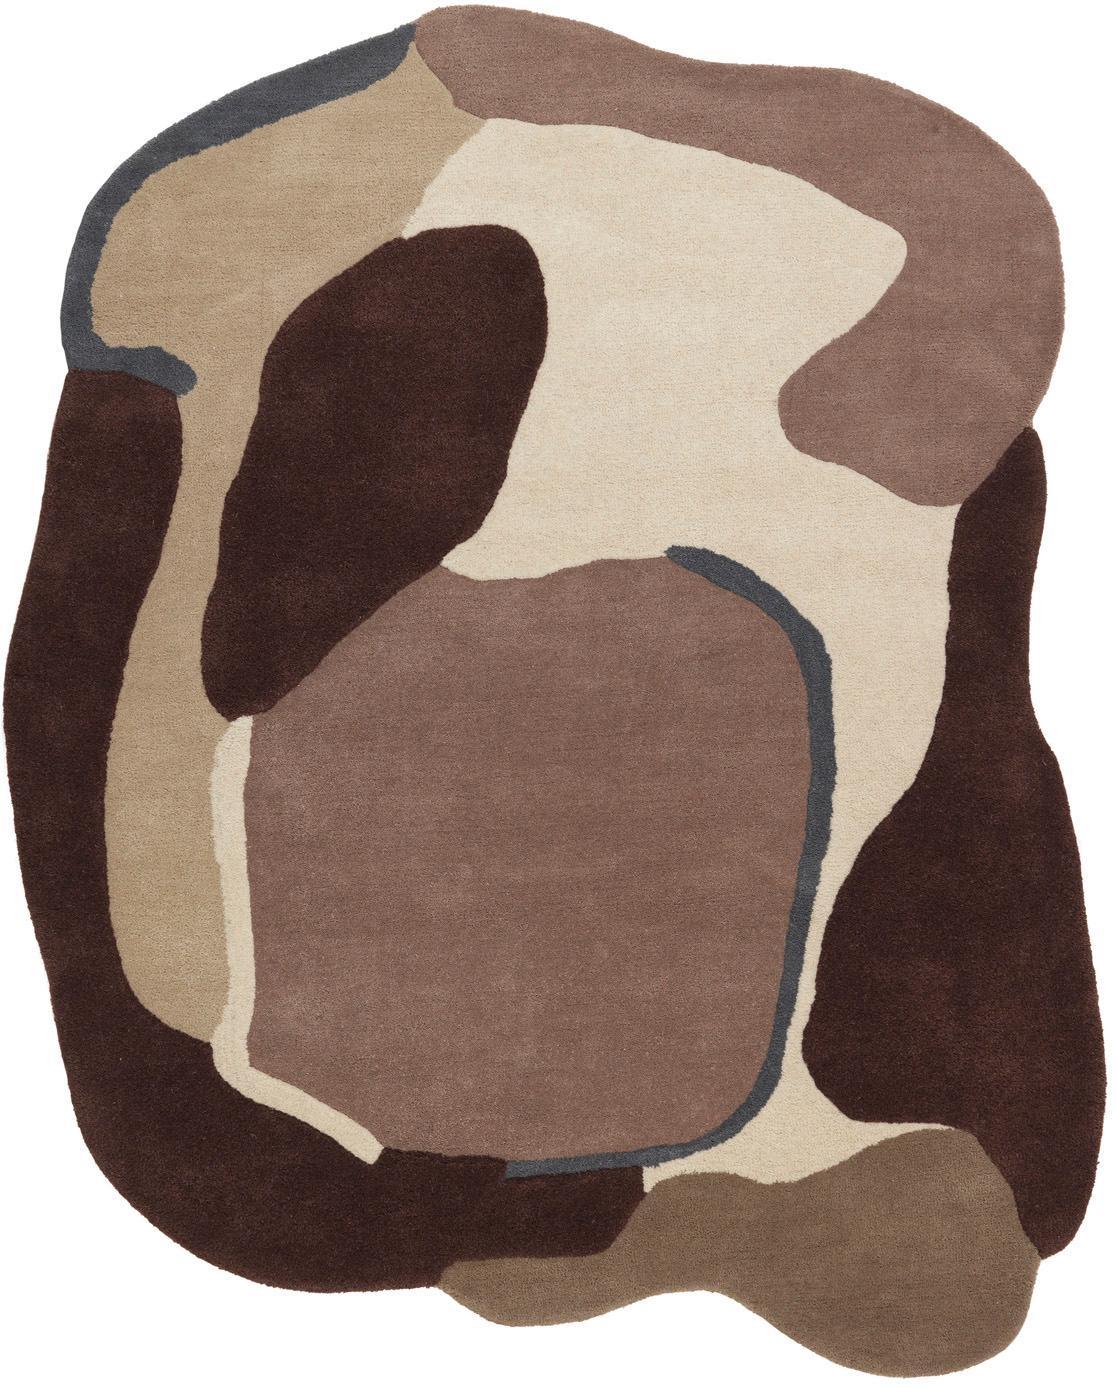 Alfombra de lana texturizada Oblivian, Parte superior: lana, Reverso: 55%algodón, 45%poliéste, Rojo, beige, An 140 x L 180 cm (Tamaño S)